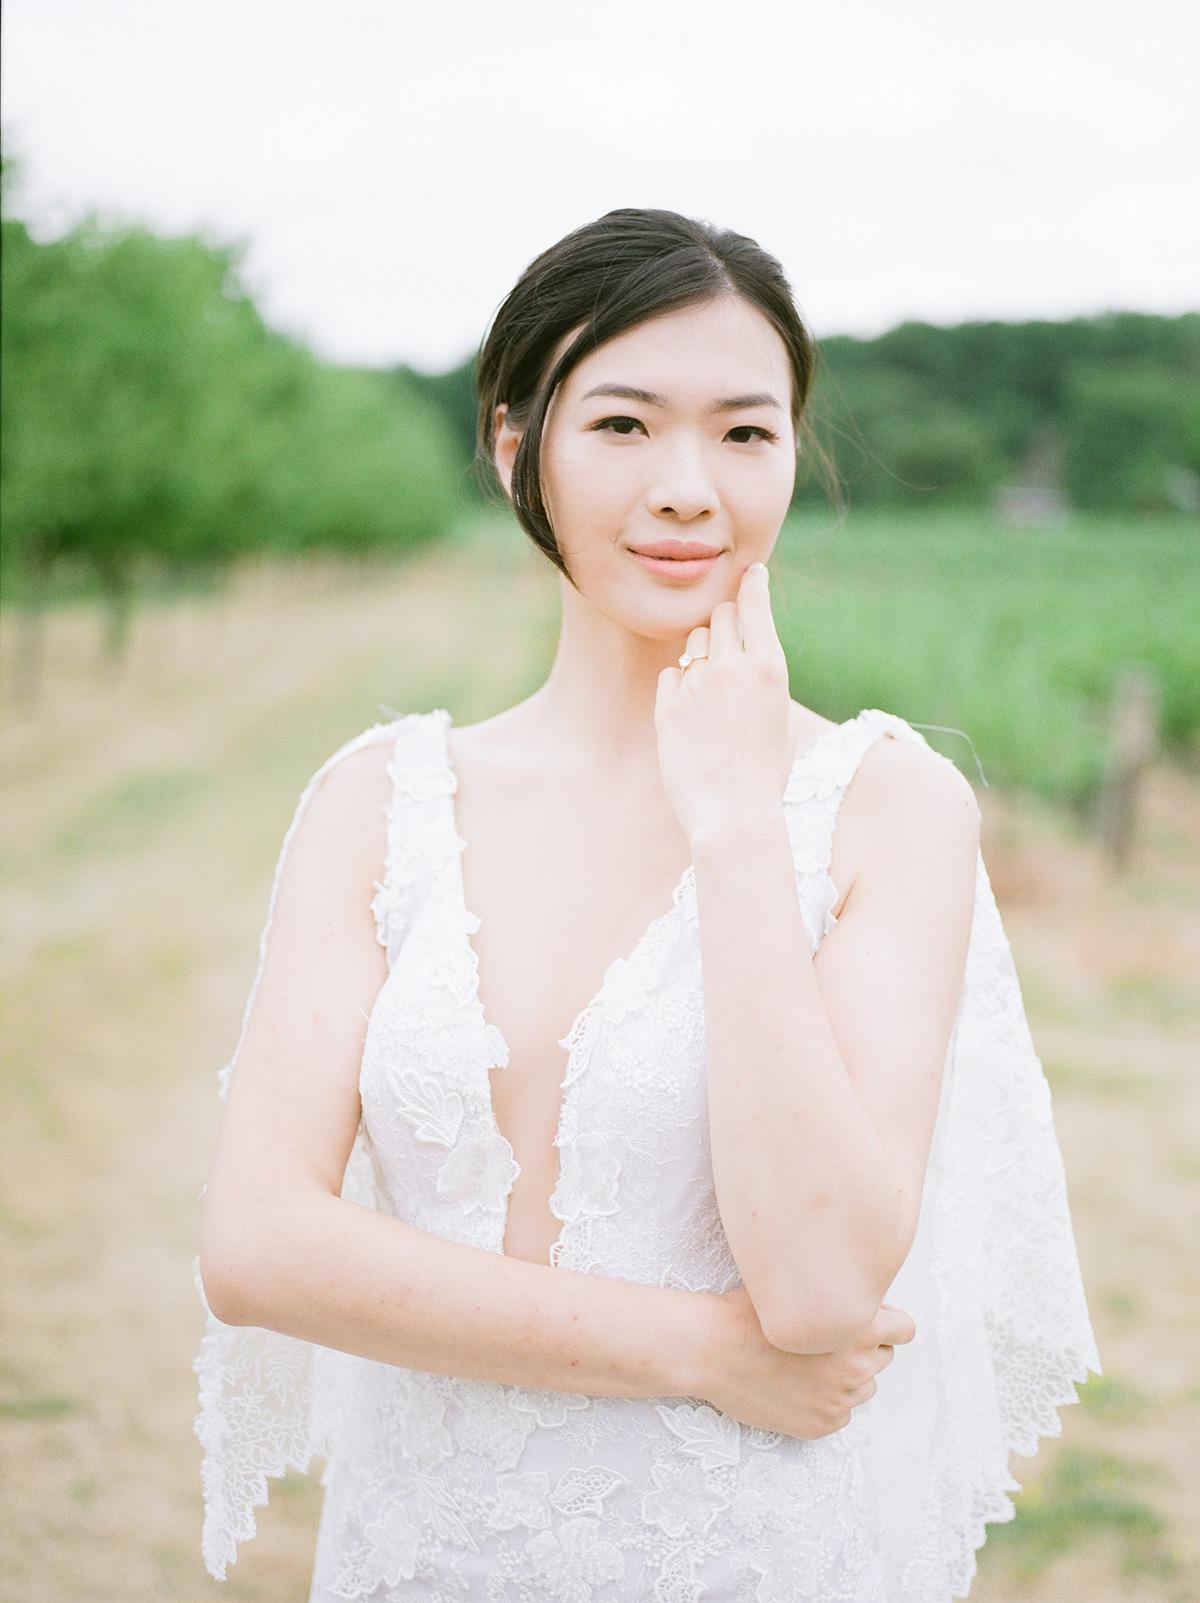 jennifer-xu-photography-vineyard-bride-swish-list-rosewod-eatstes-winery-beamsville-wedding-editorial-6.jpg